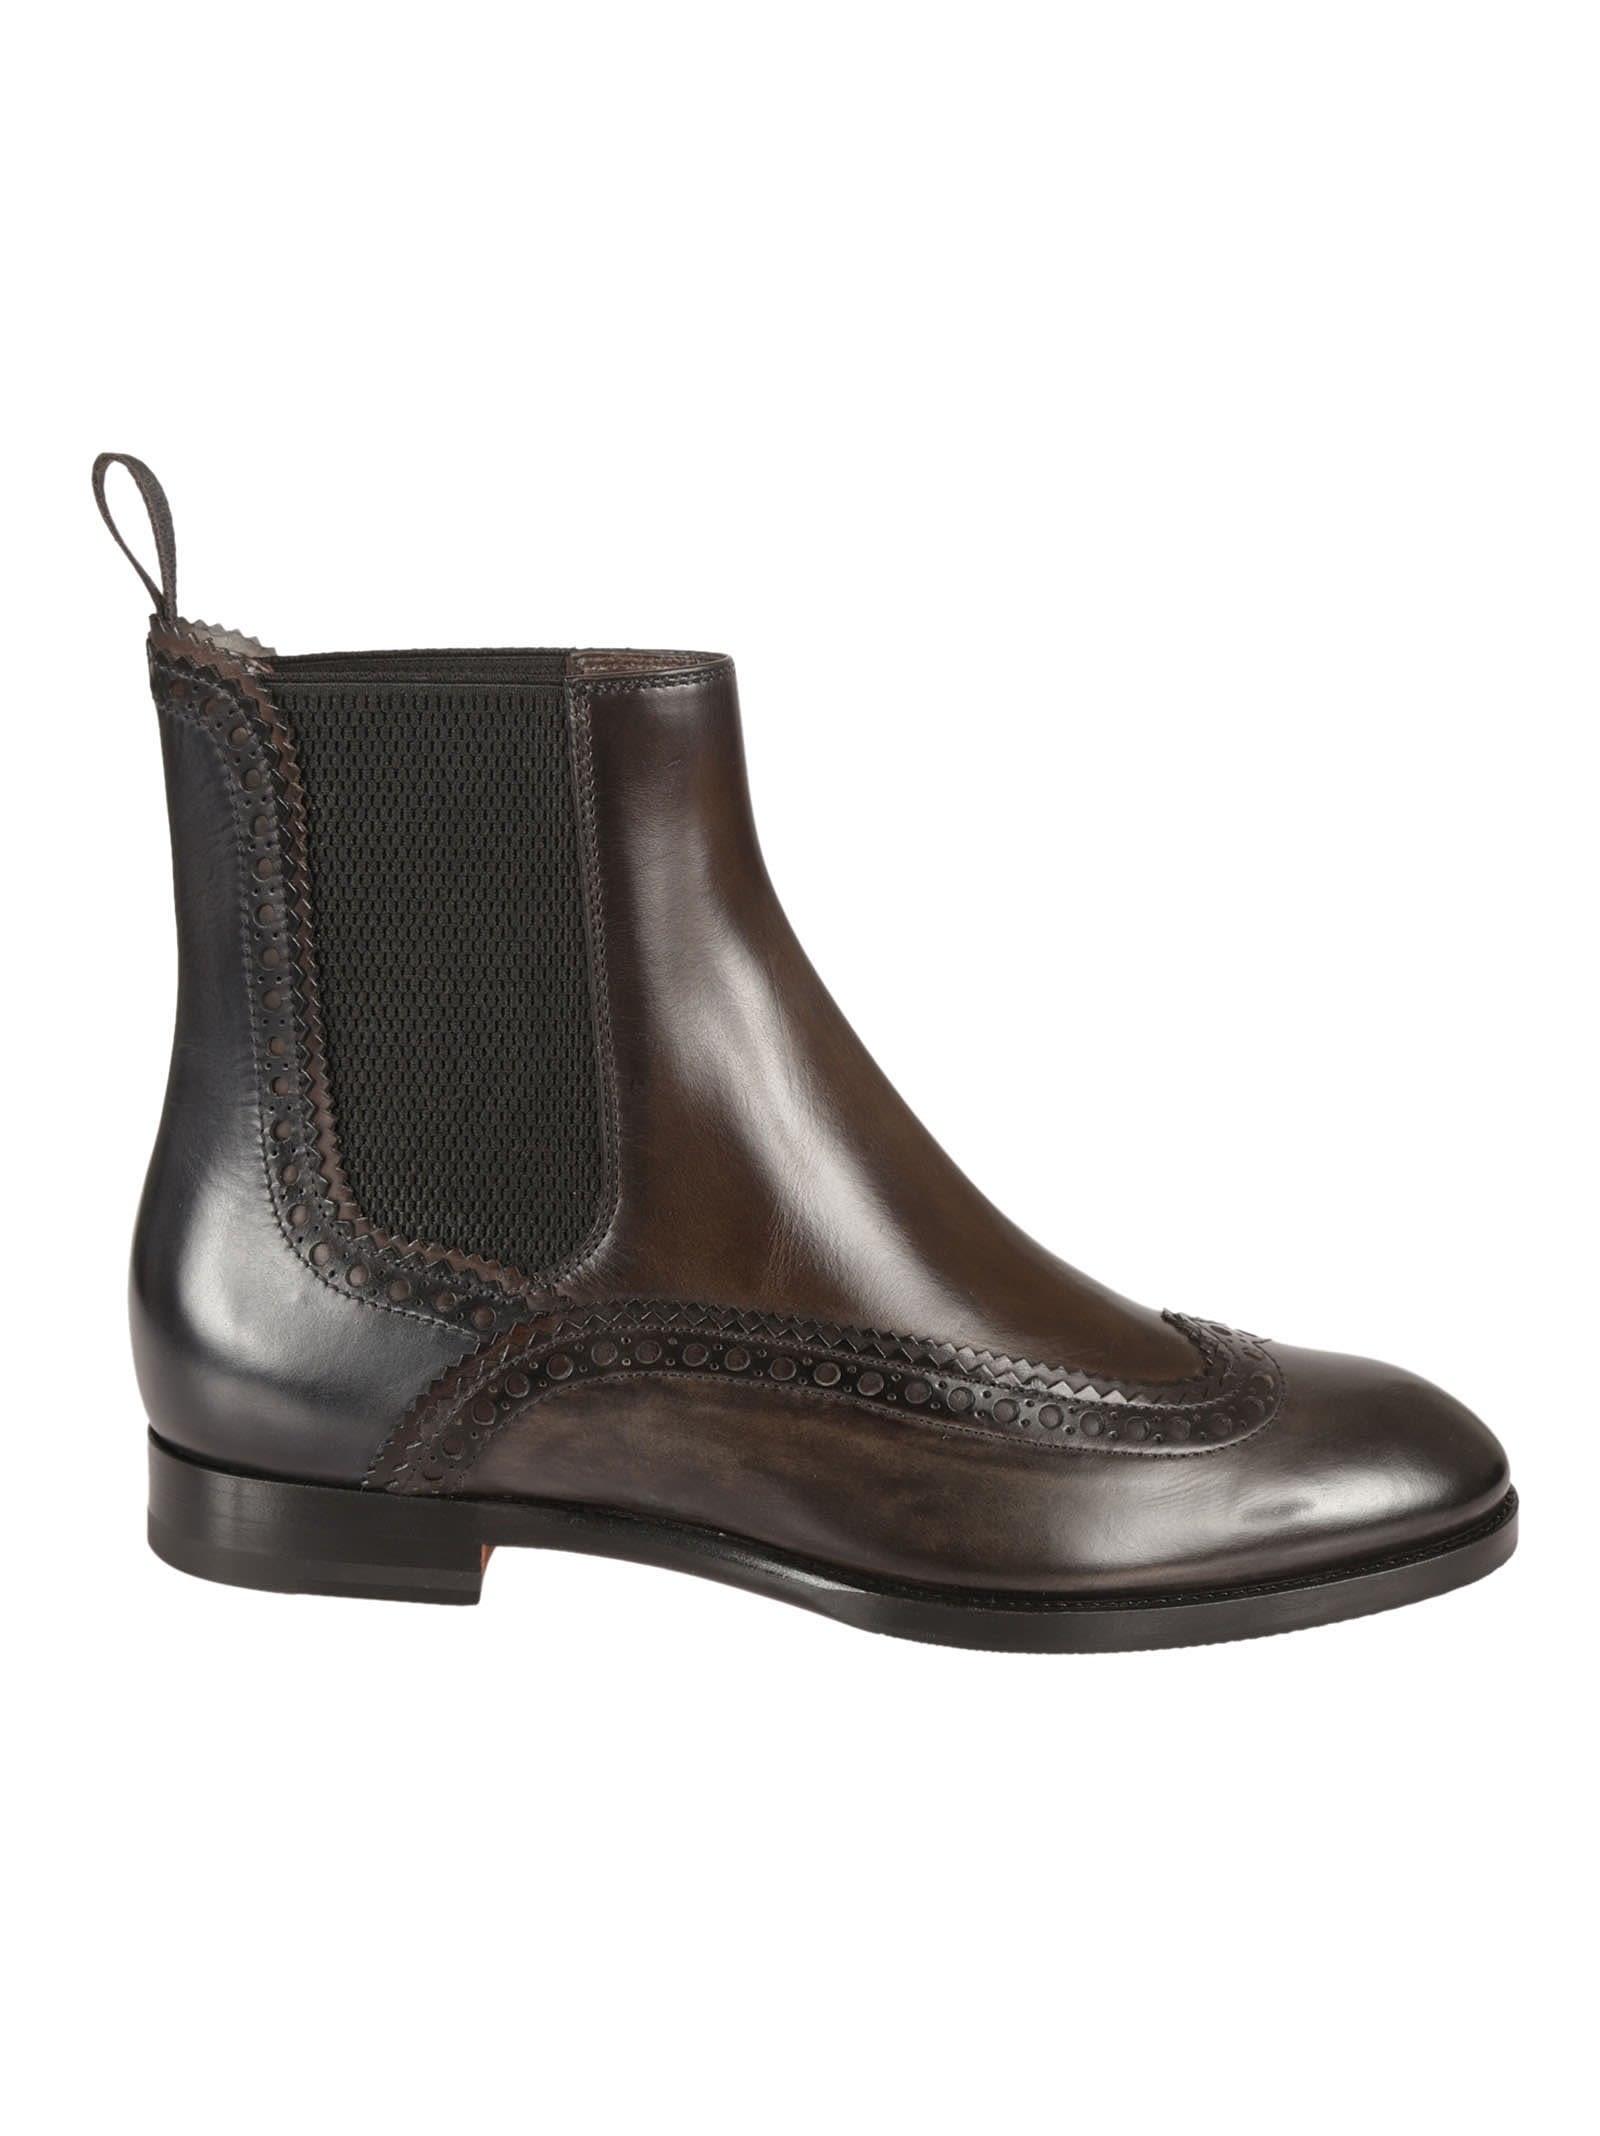 Santoni Brogues Chelsea Boots